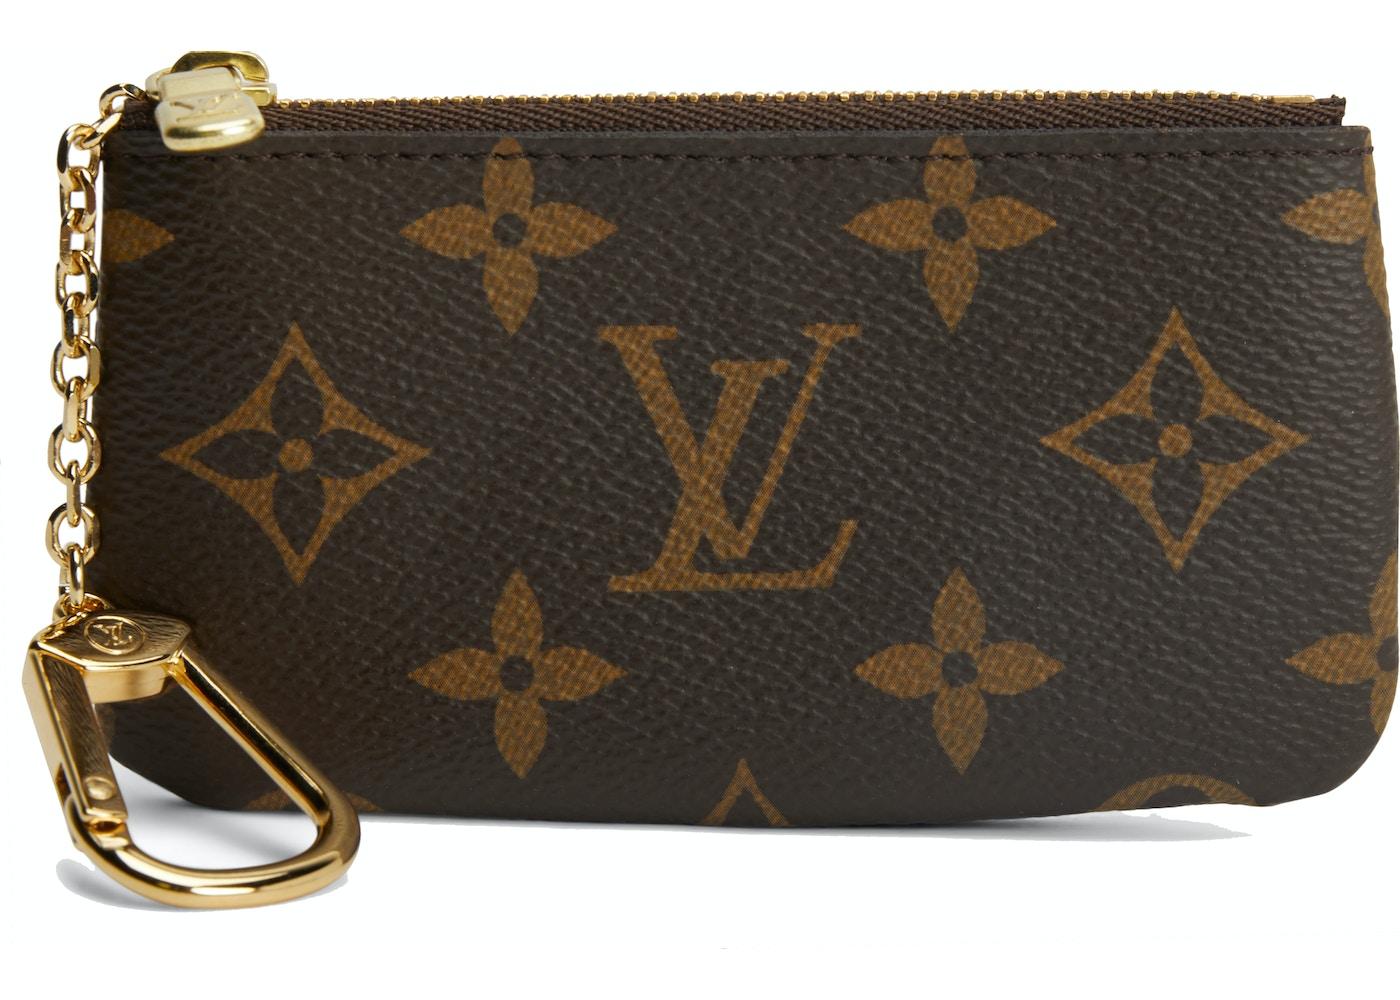 9328ef9305ed Louis Vuitton Key Pouch Monogram Brown. Monogram Brown